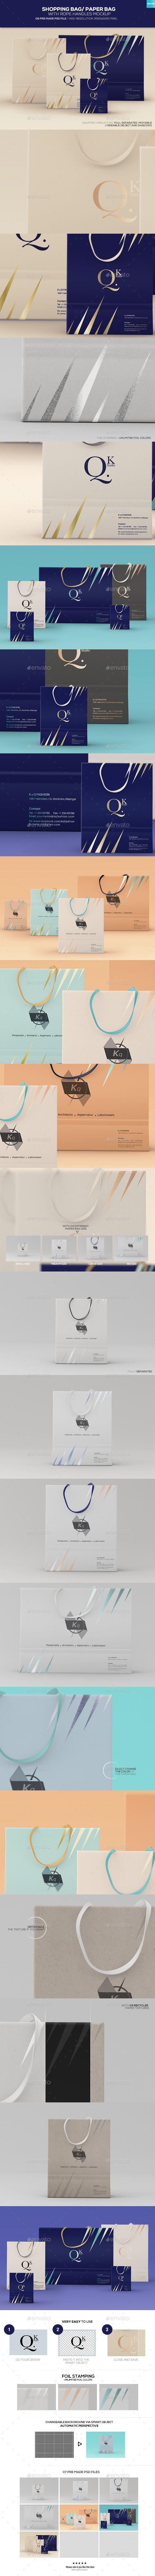 Shopping Bag/ Paper Bag With Rope Handles Mockups #design Download: http://graphicriver.net/item/shopping-bag-paper-bag-with-rope-handles-mockups/13724296?ref=ksioks